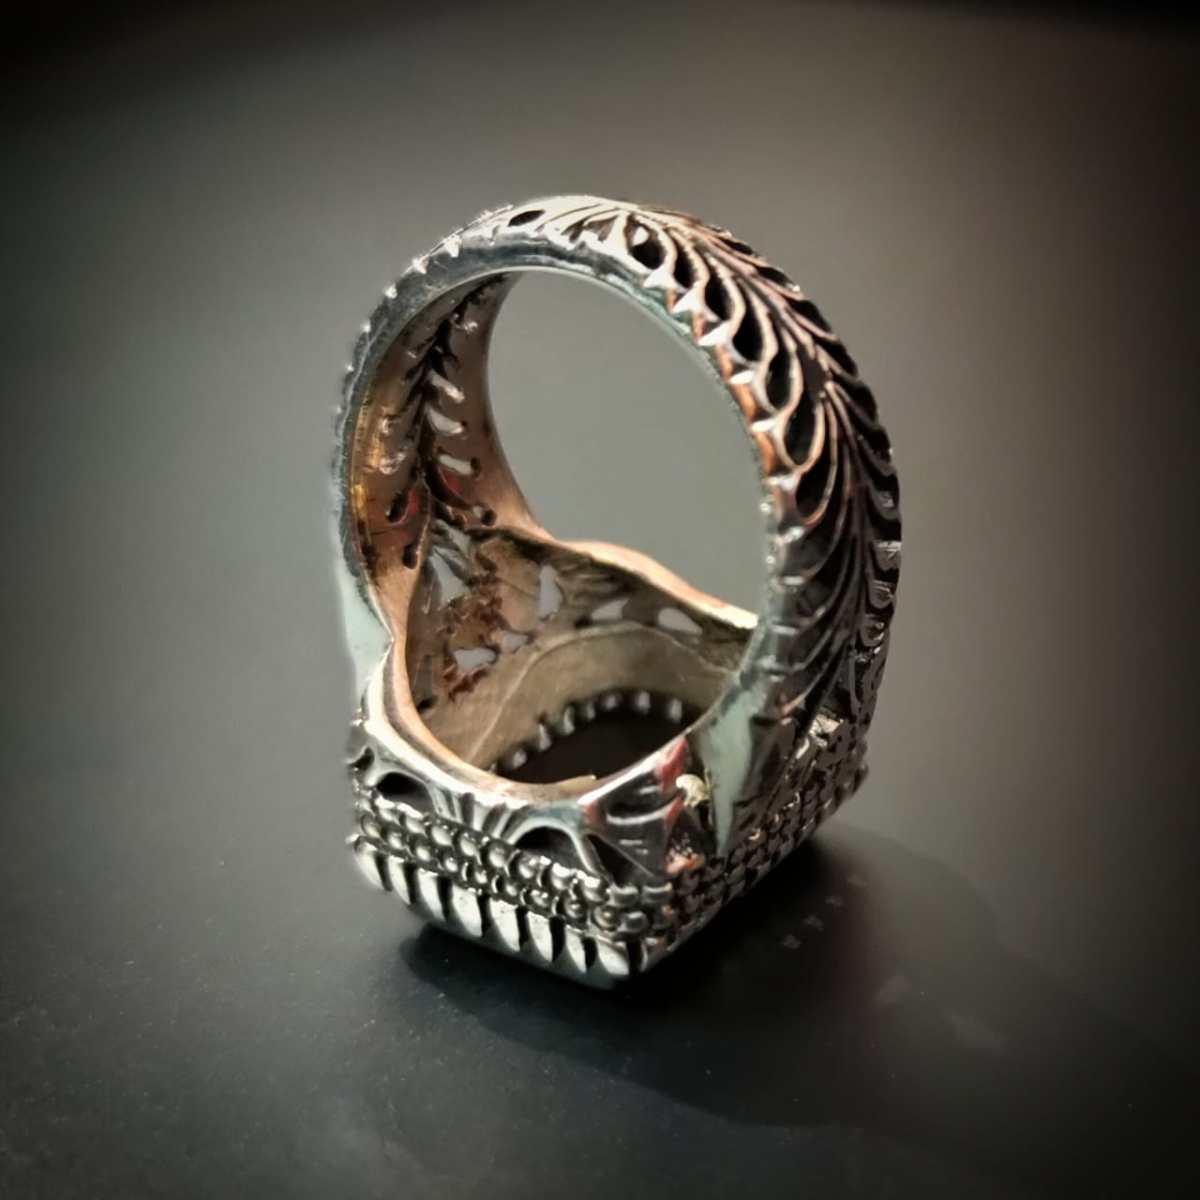 Black Aqeeq 925 Silver Handmade Ring 2 natural gemstones pakistan + 925 silver jewelry online